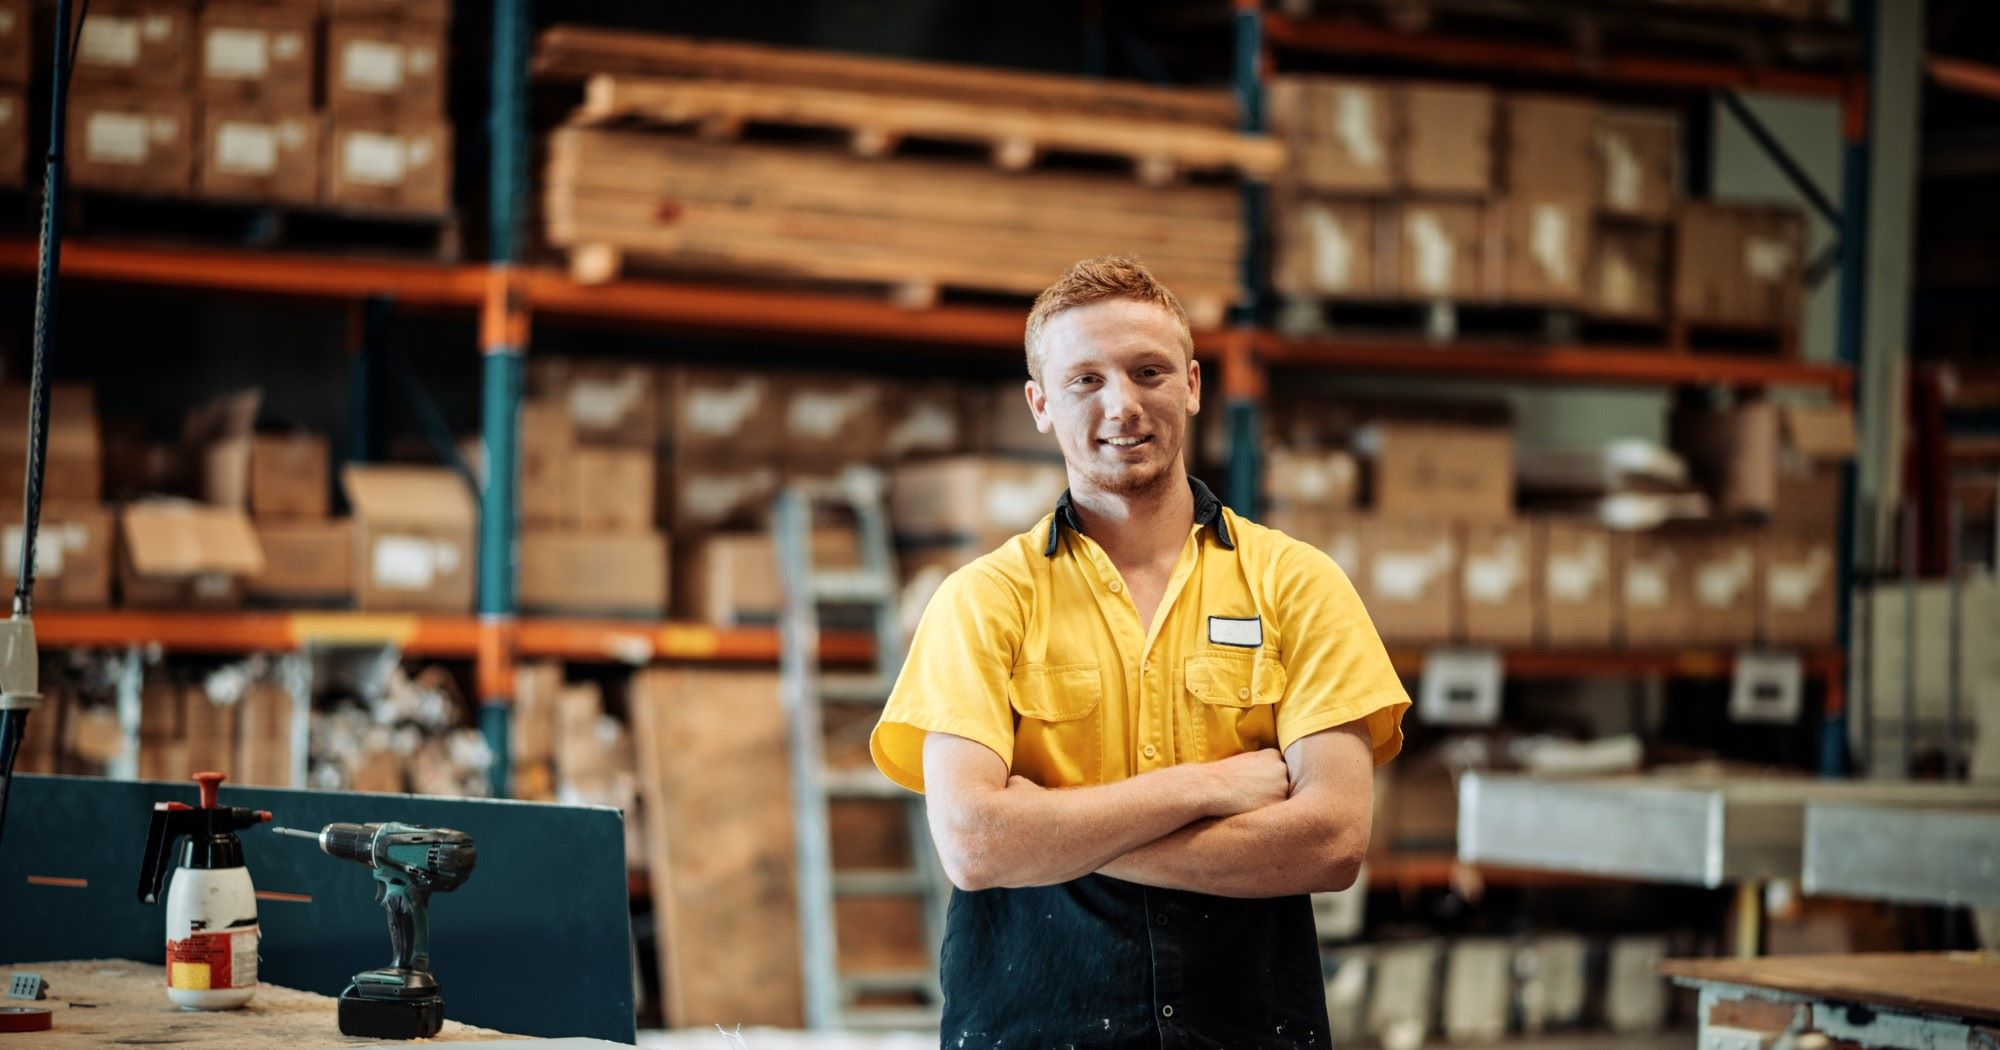 man smiling in a workshop